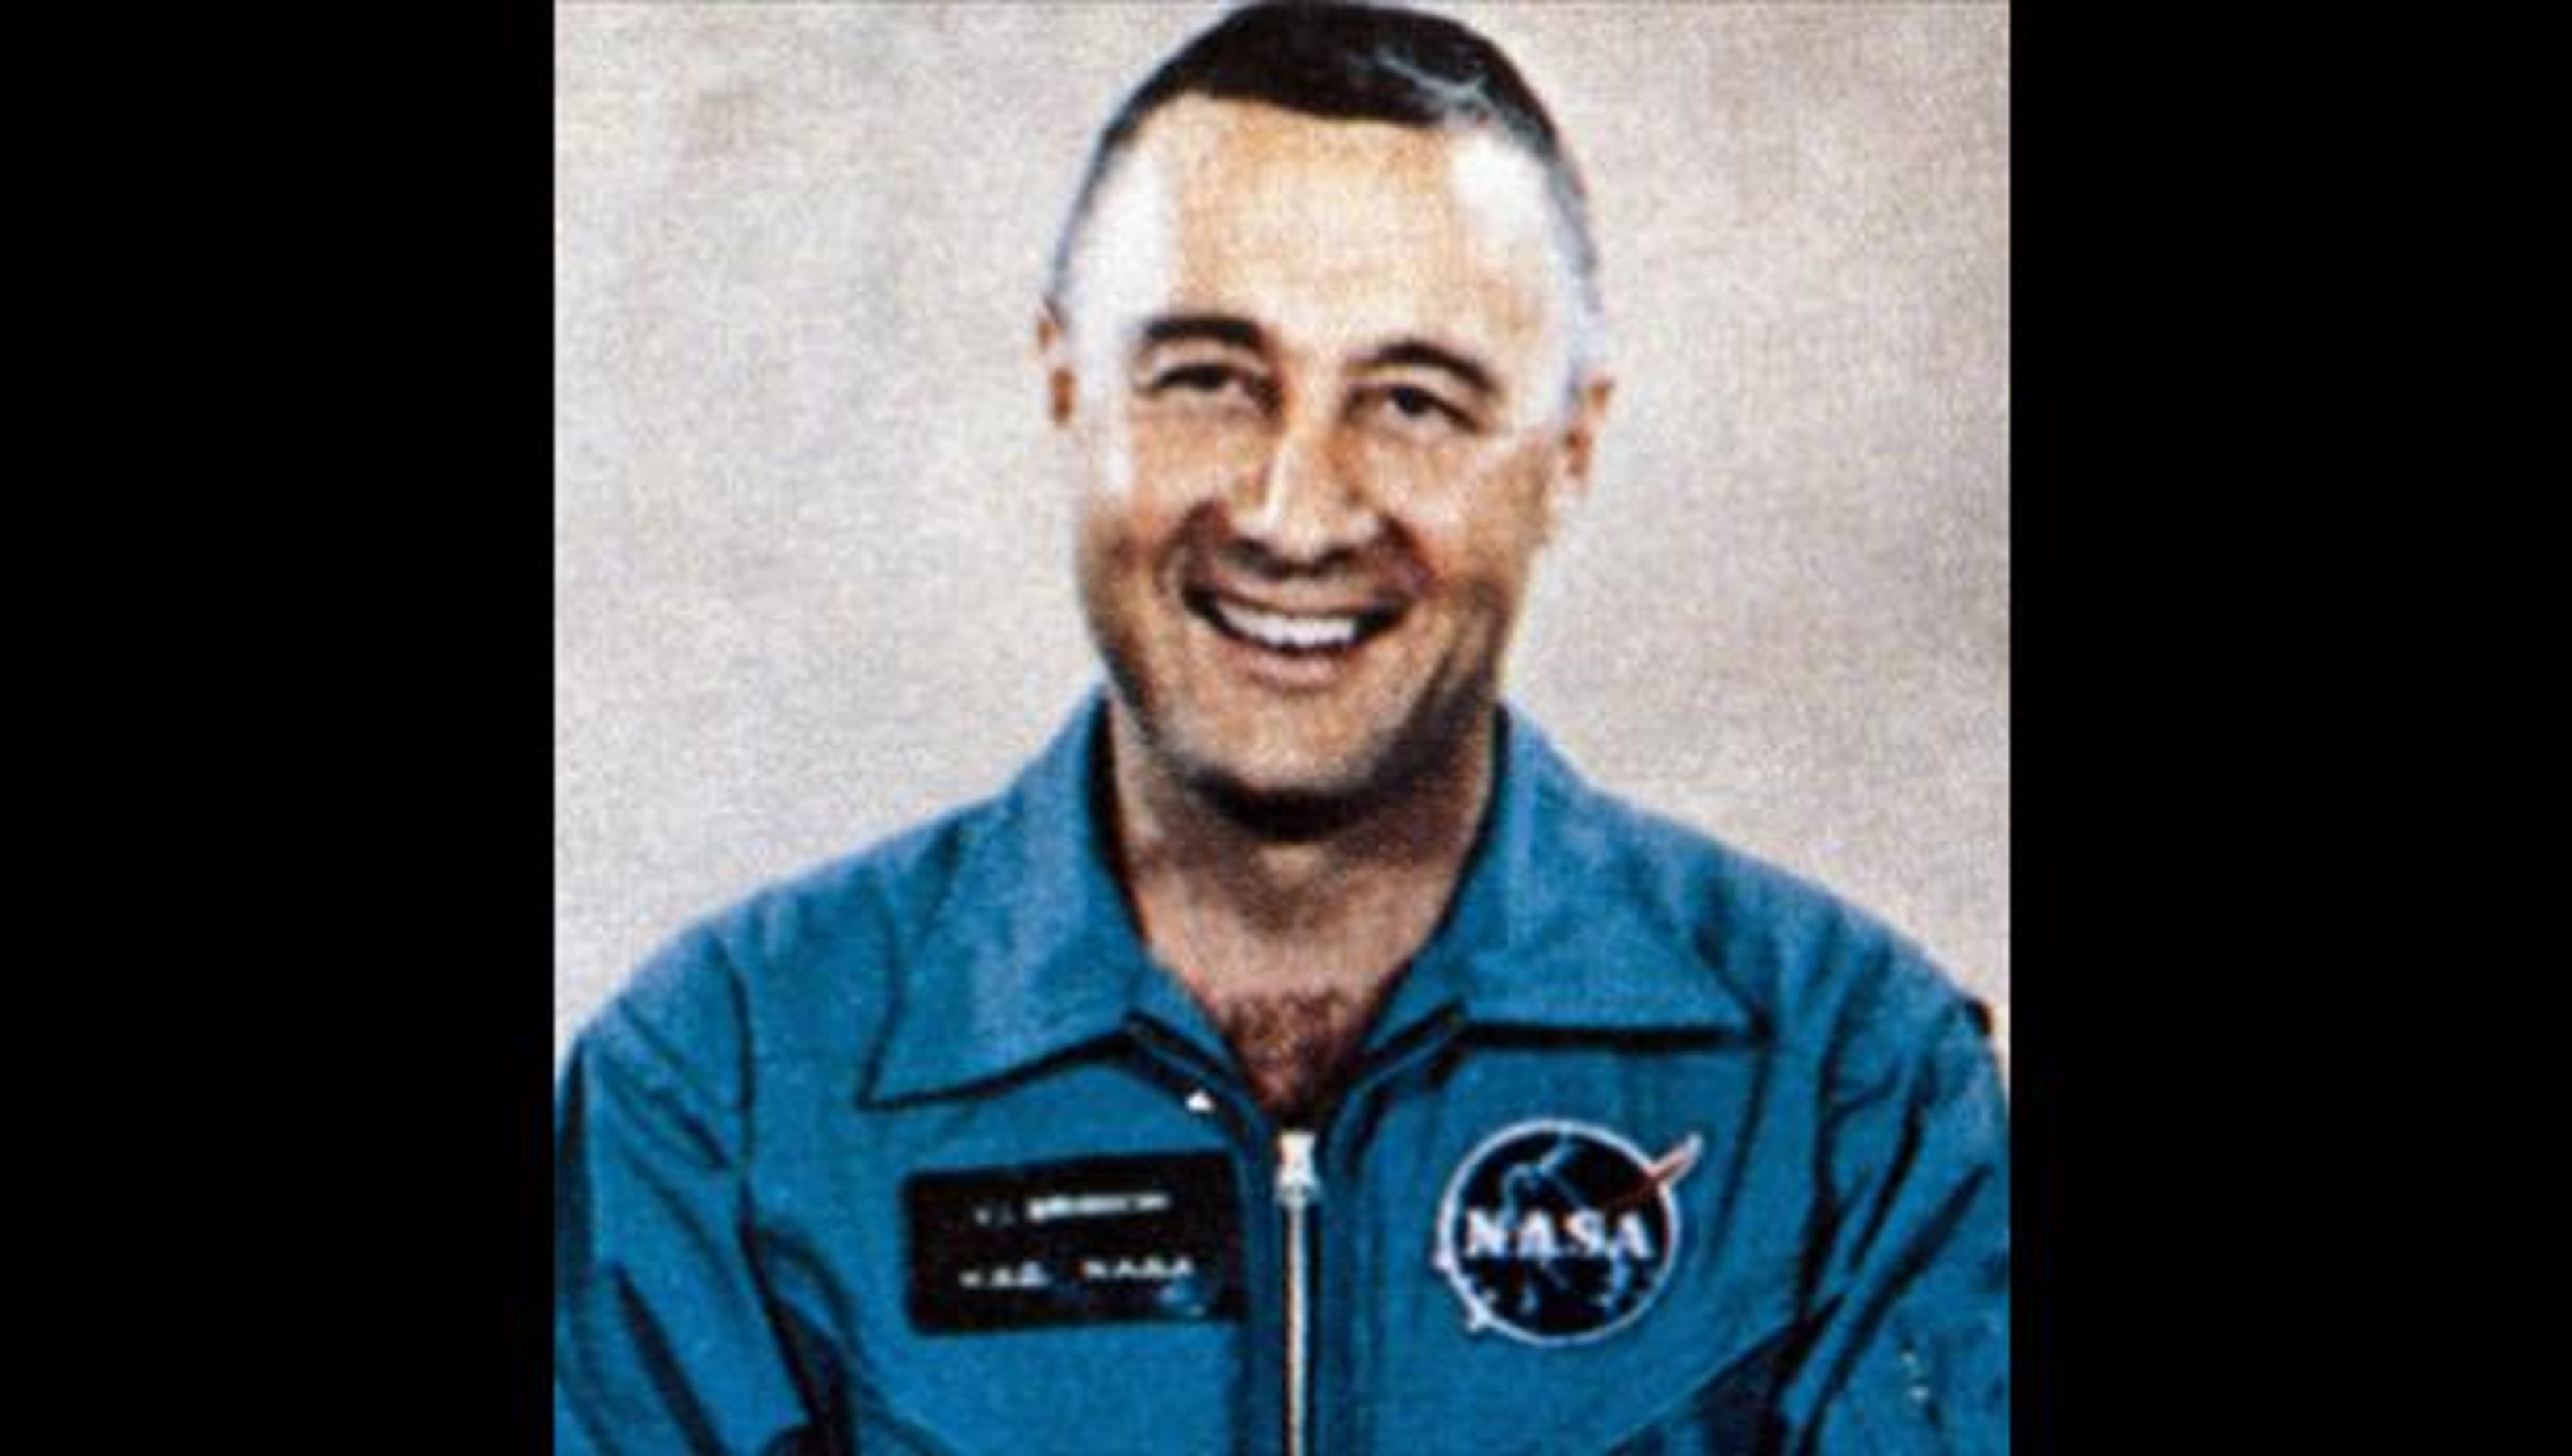 astronaut grissom death - photo #34